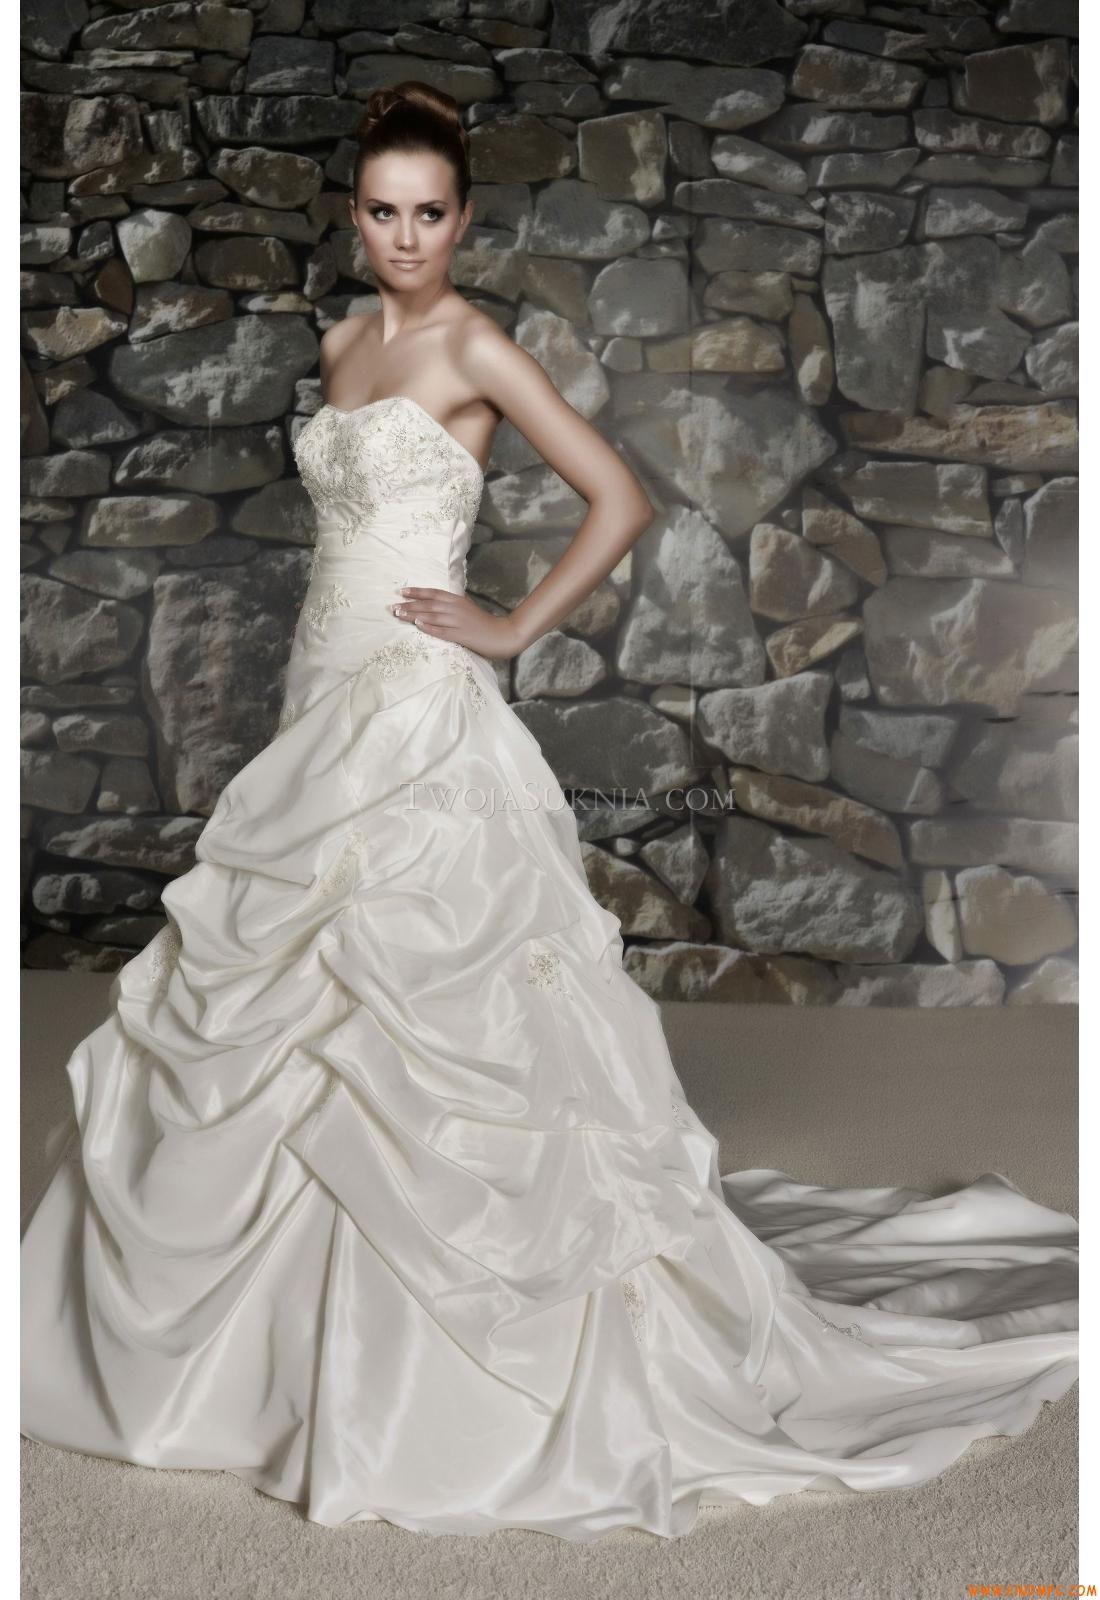 Vestidos de noiva Lisa Donetti 70231 2012